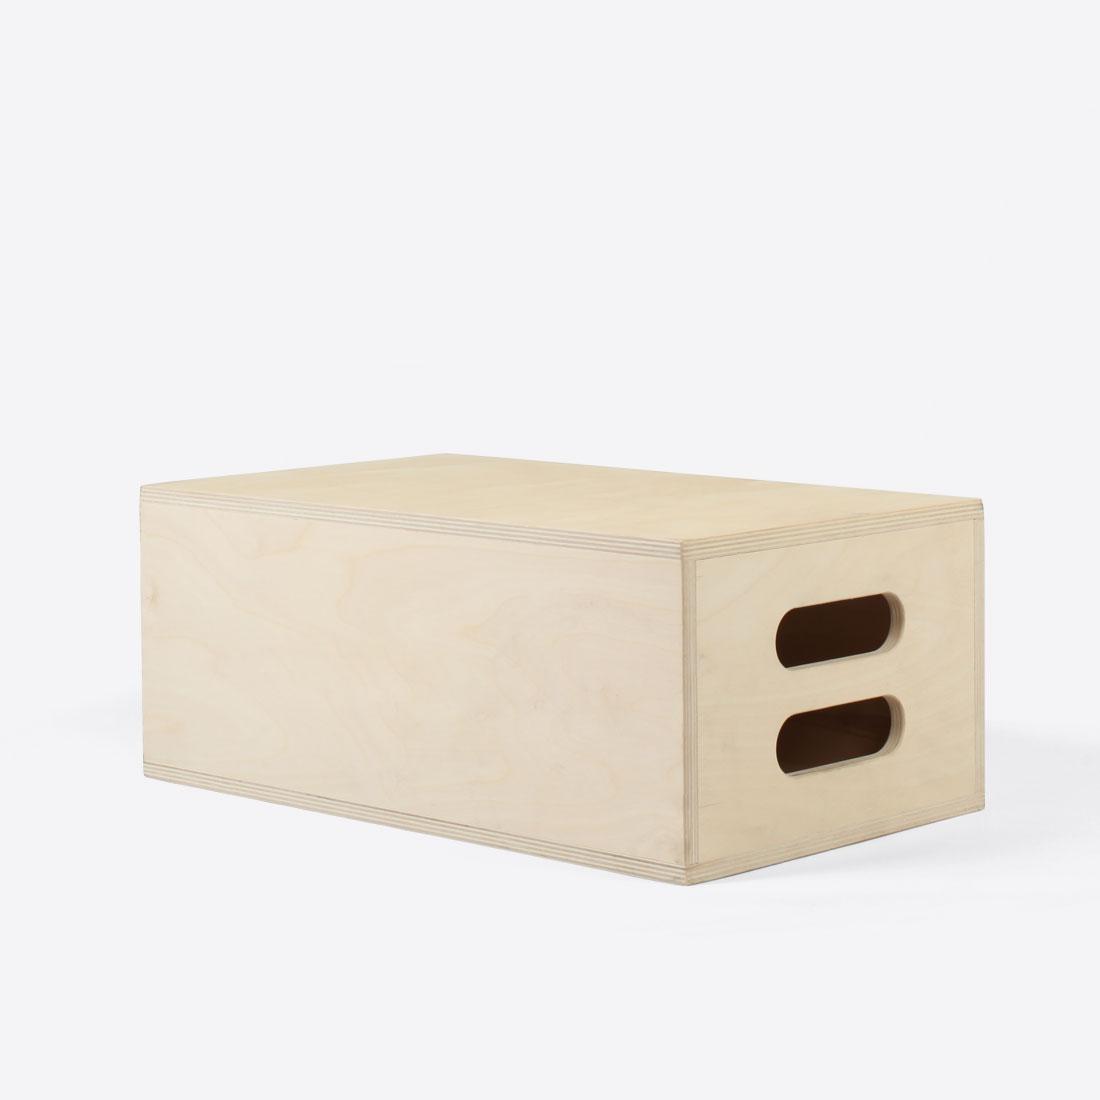 image of apple box